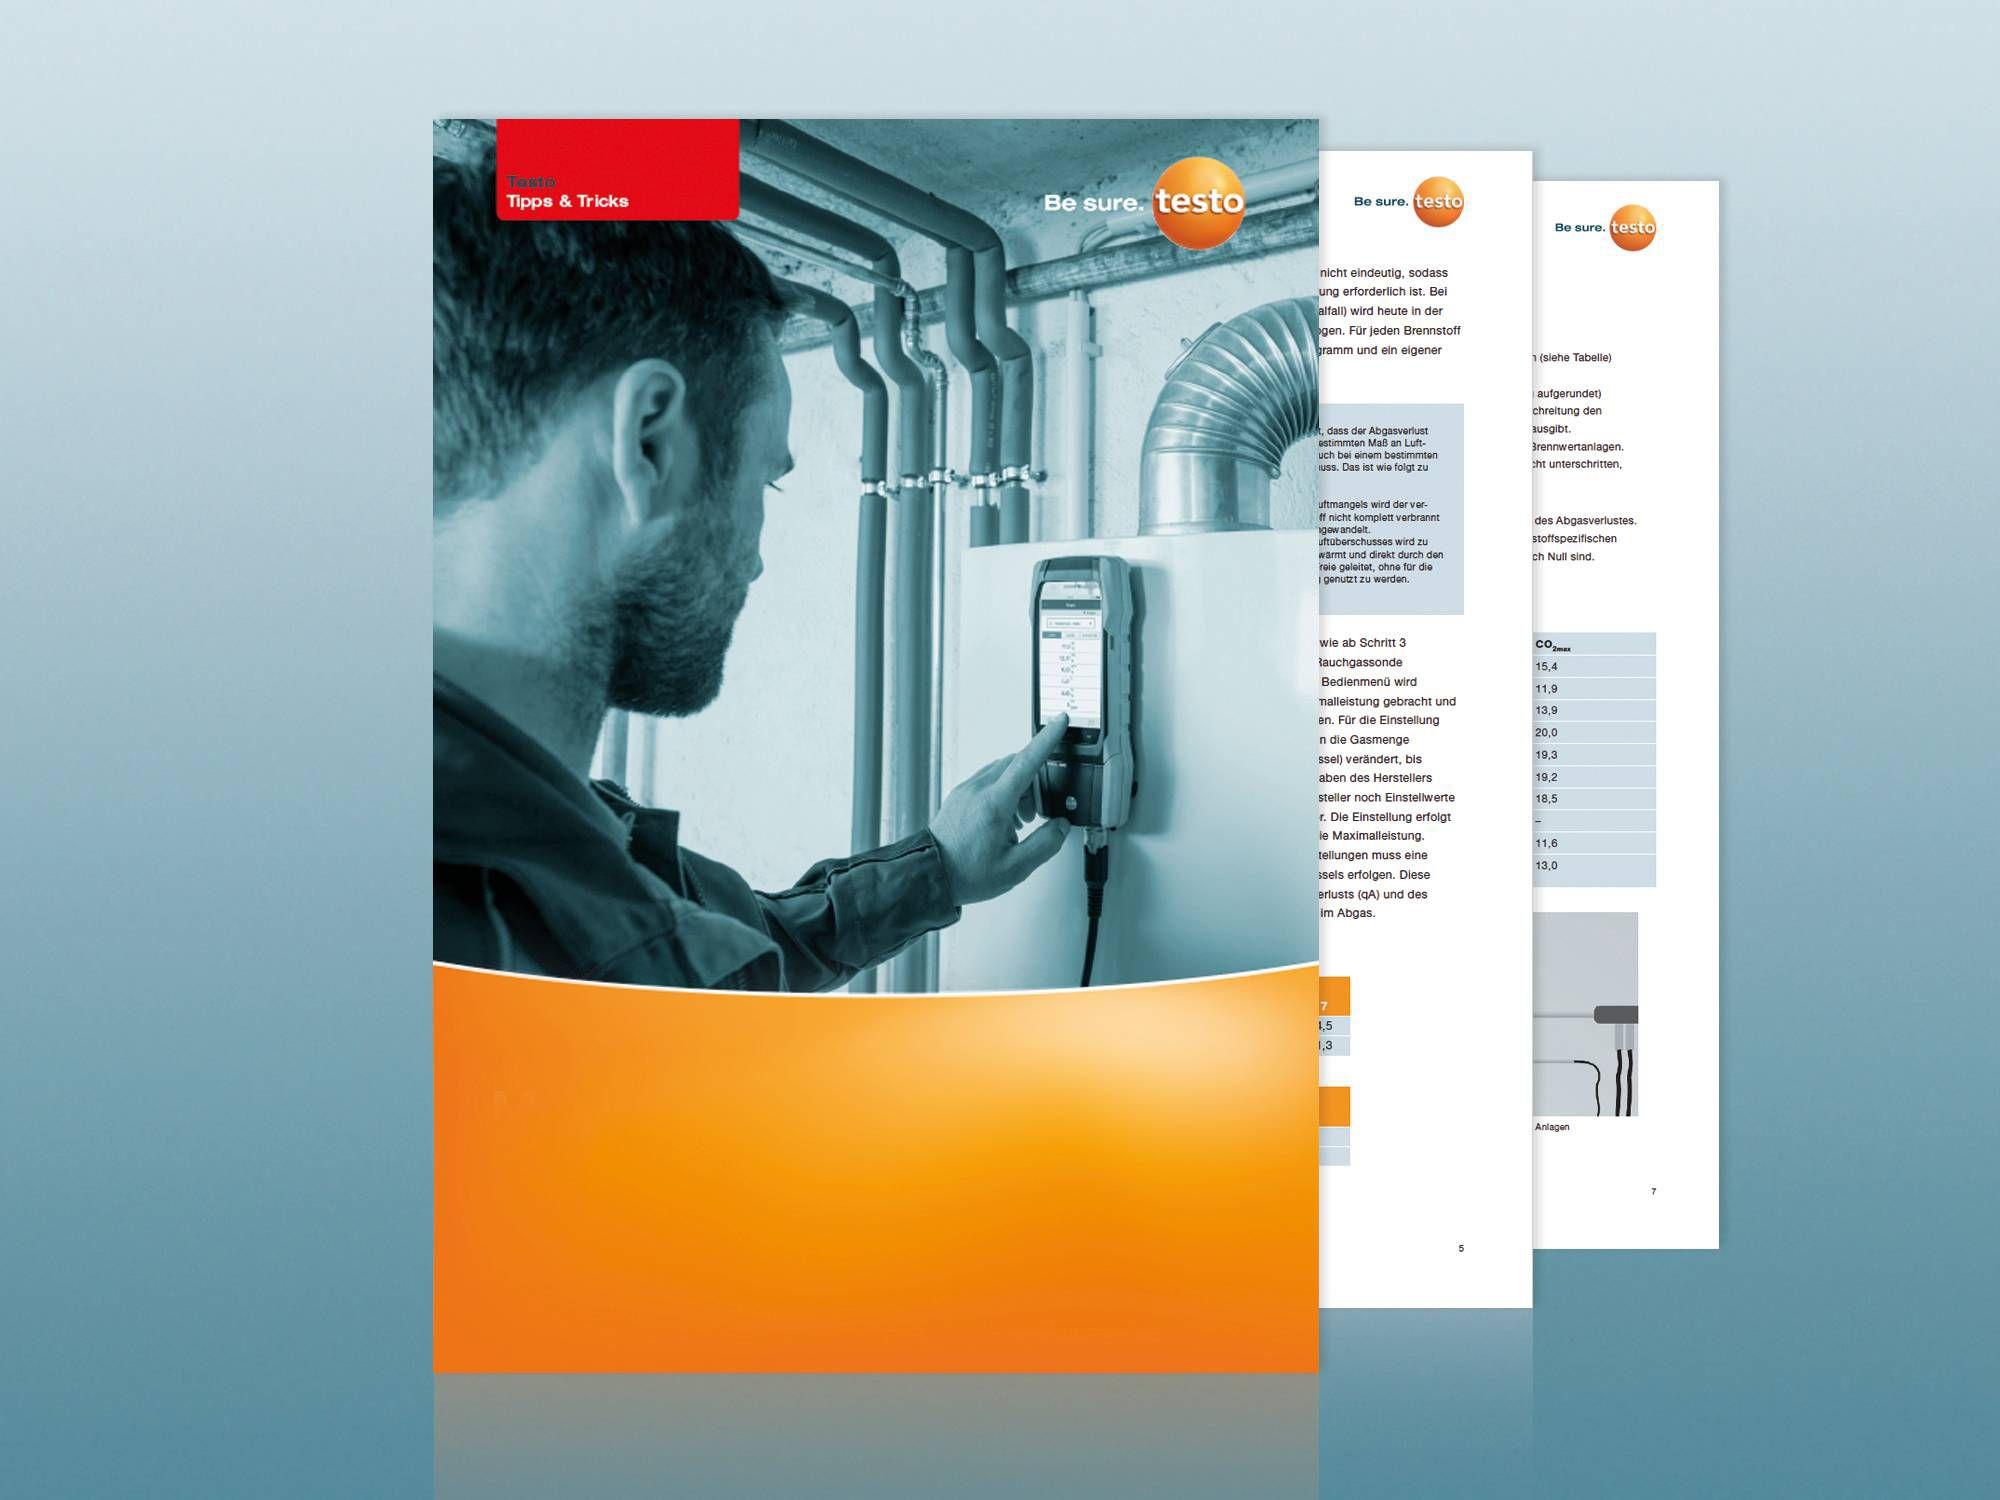 Heating-2021-Website-Banner-13-2000x1500.jpg